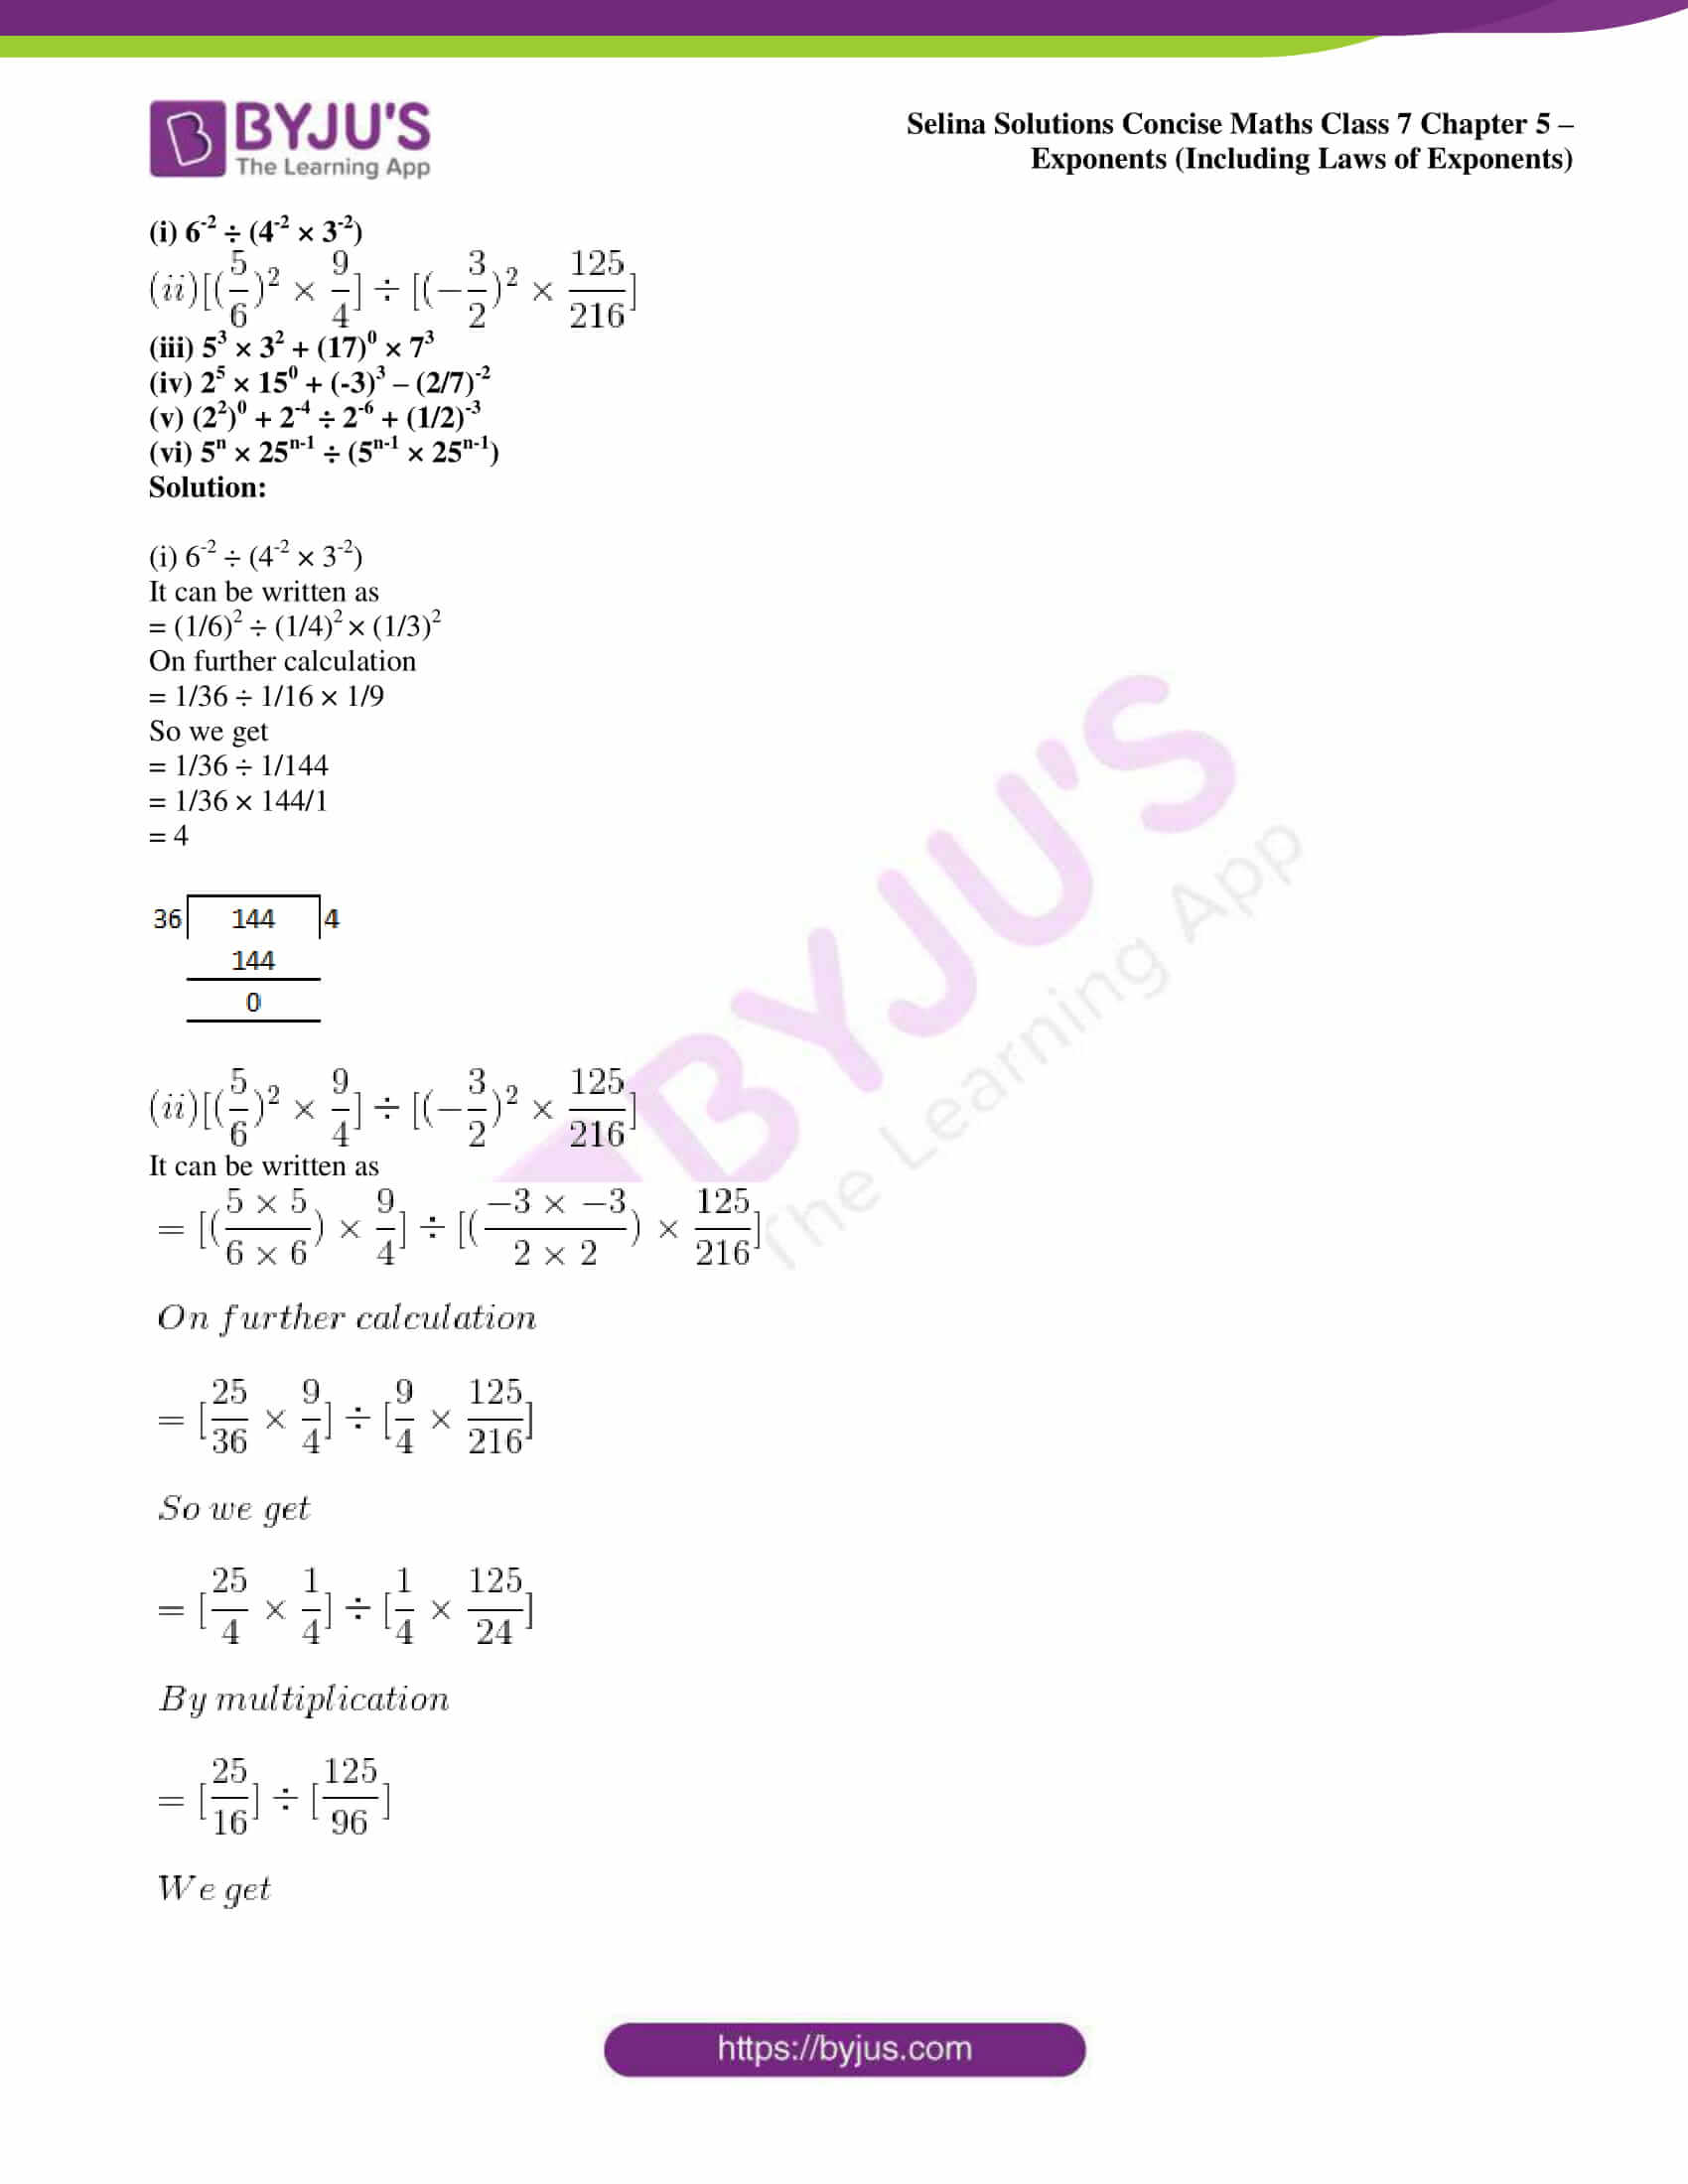 selina sol concise maths class 7 ch5 ex 5b 12